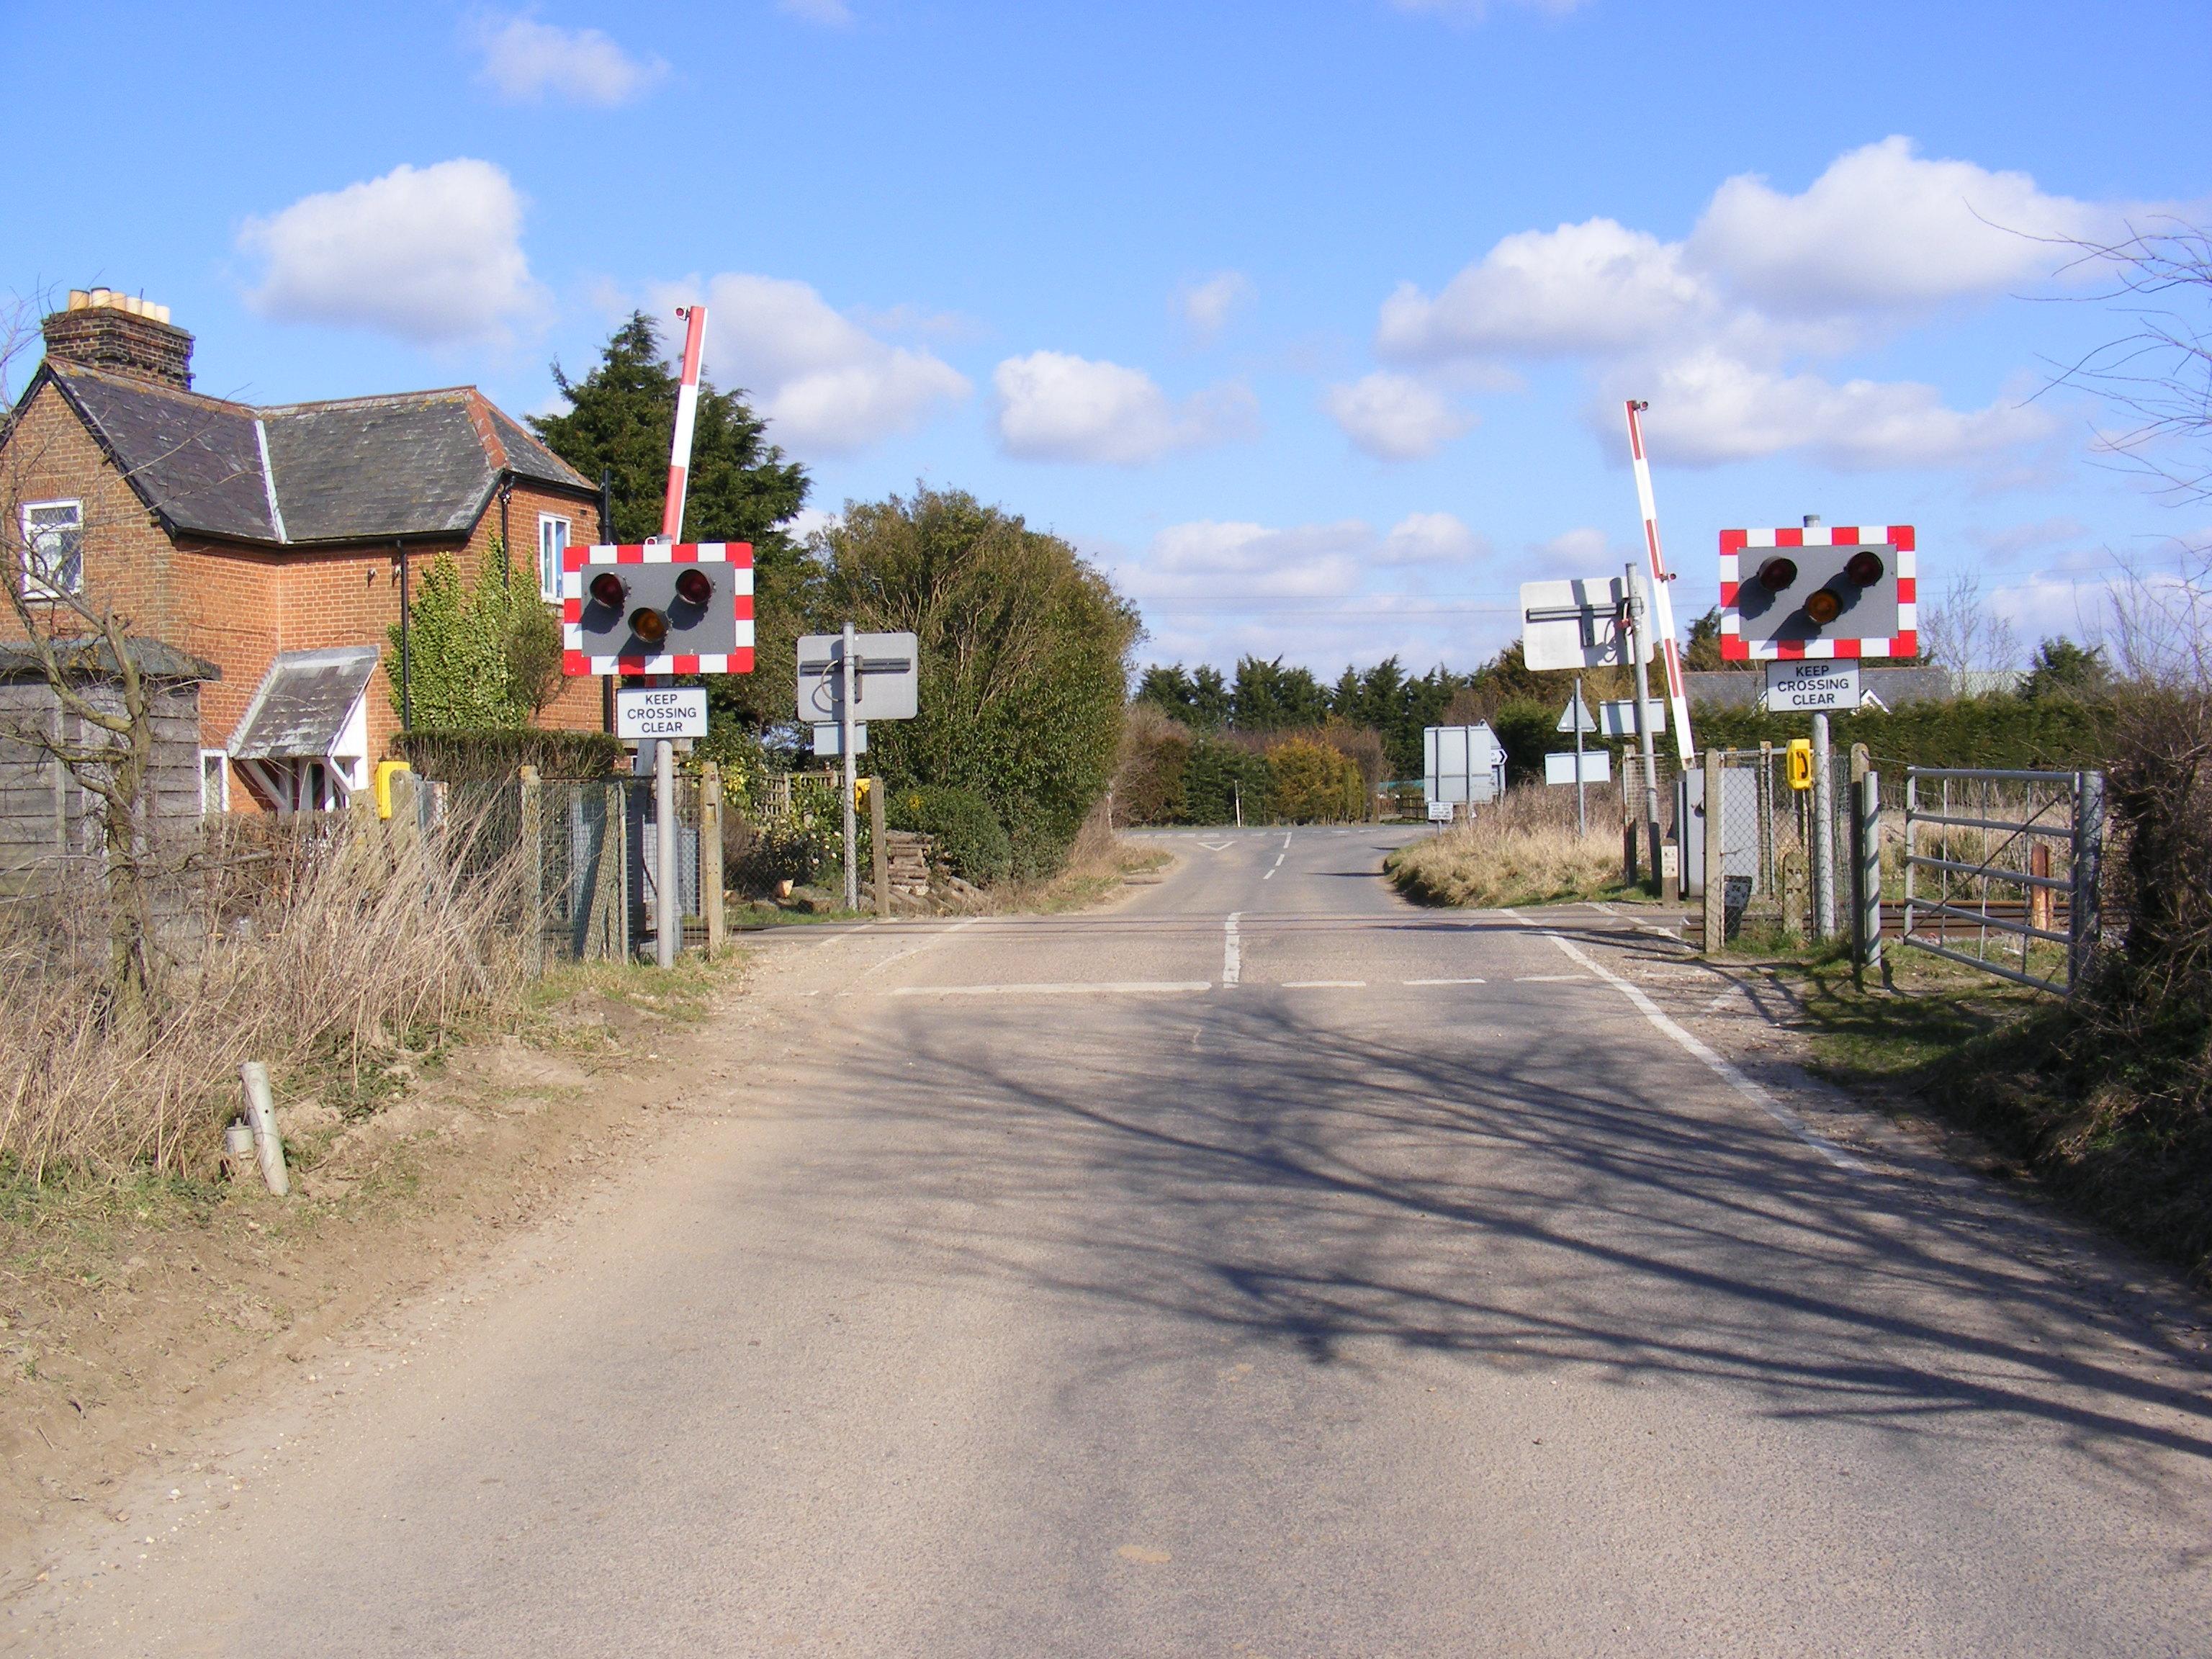 File:Level Crossing, Stratton Drift, Levington - geograph.org.uk ...